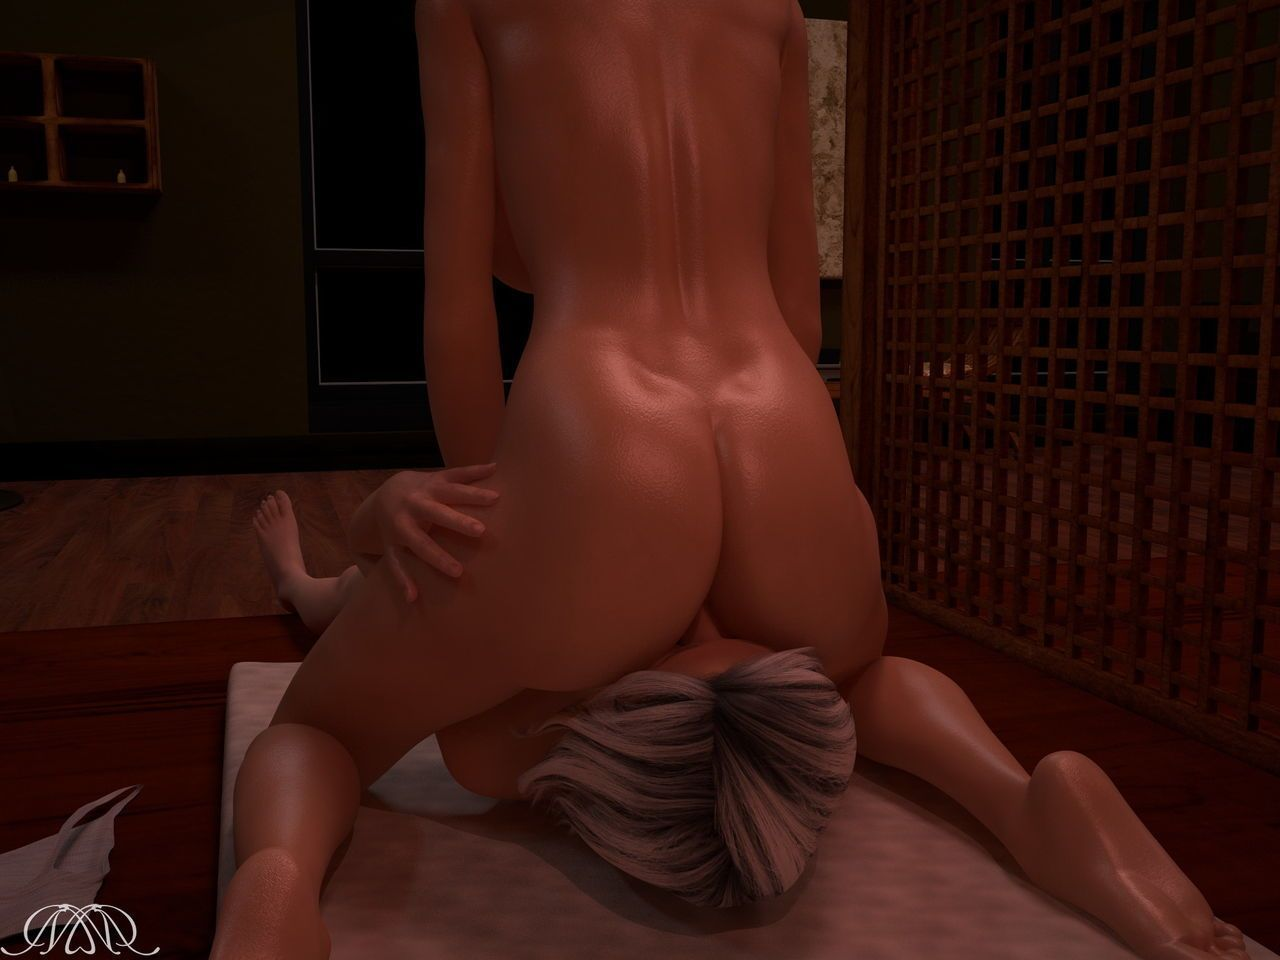 [Morfium] Afterwork Massage - part 8